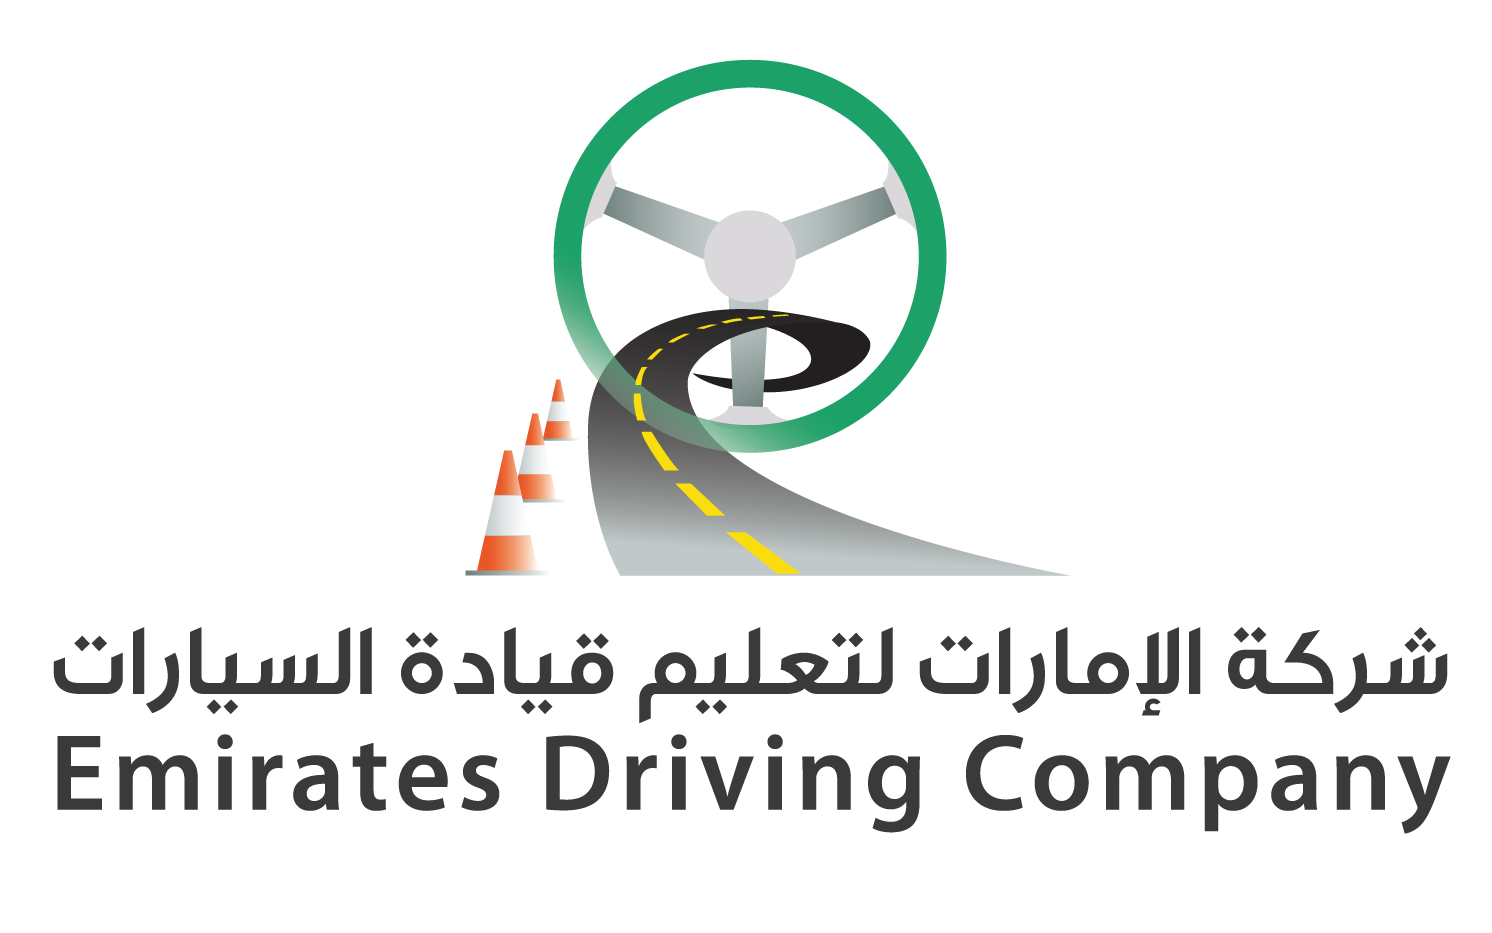 Emirates Driving Company